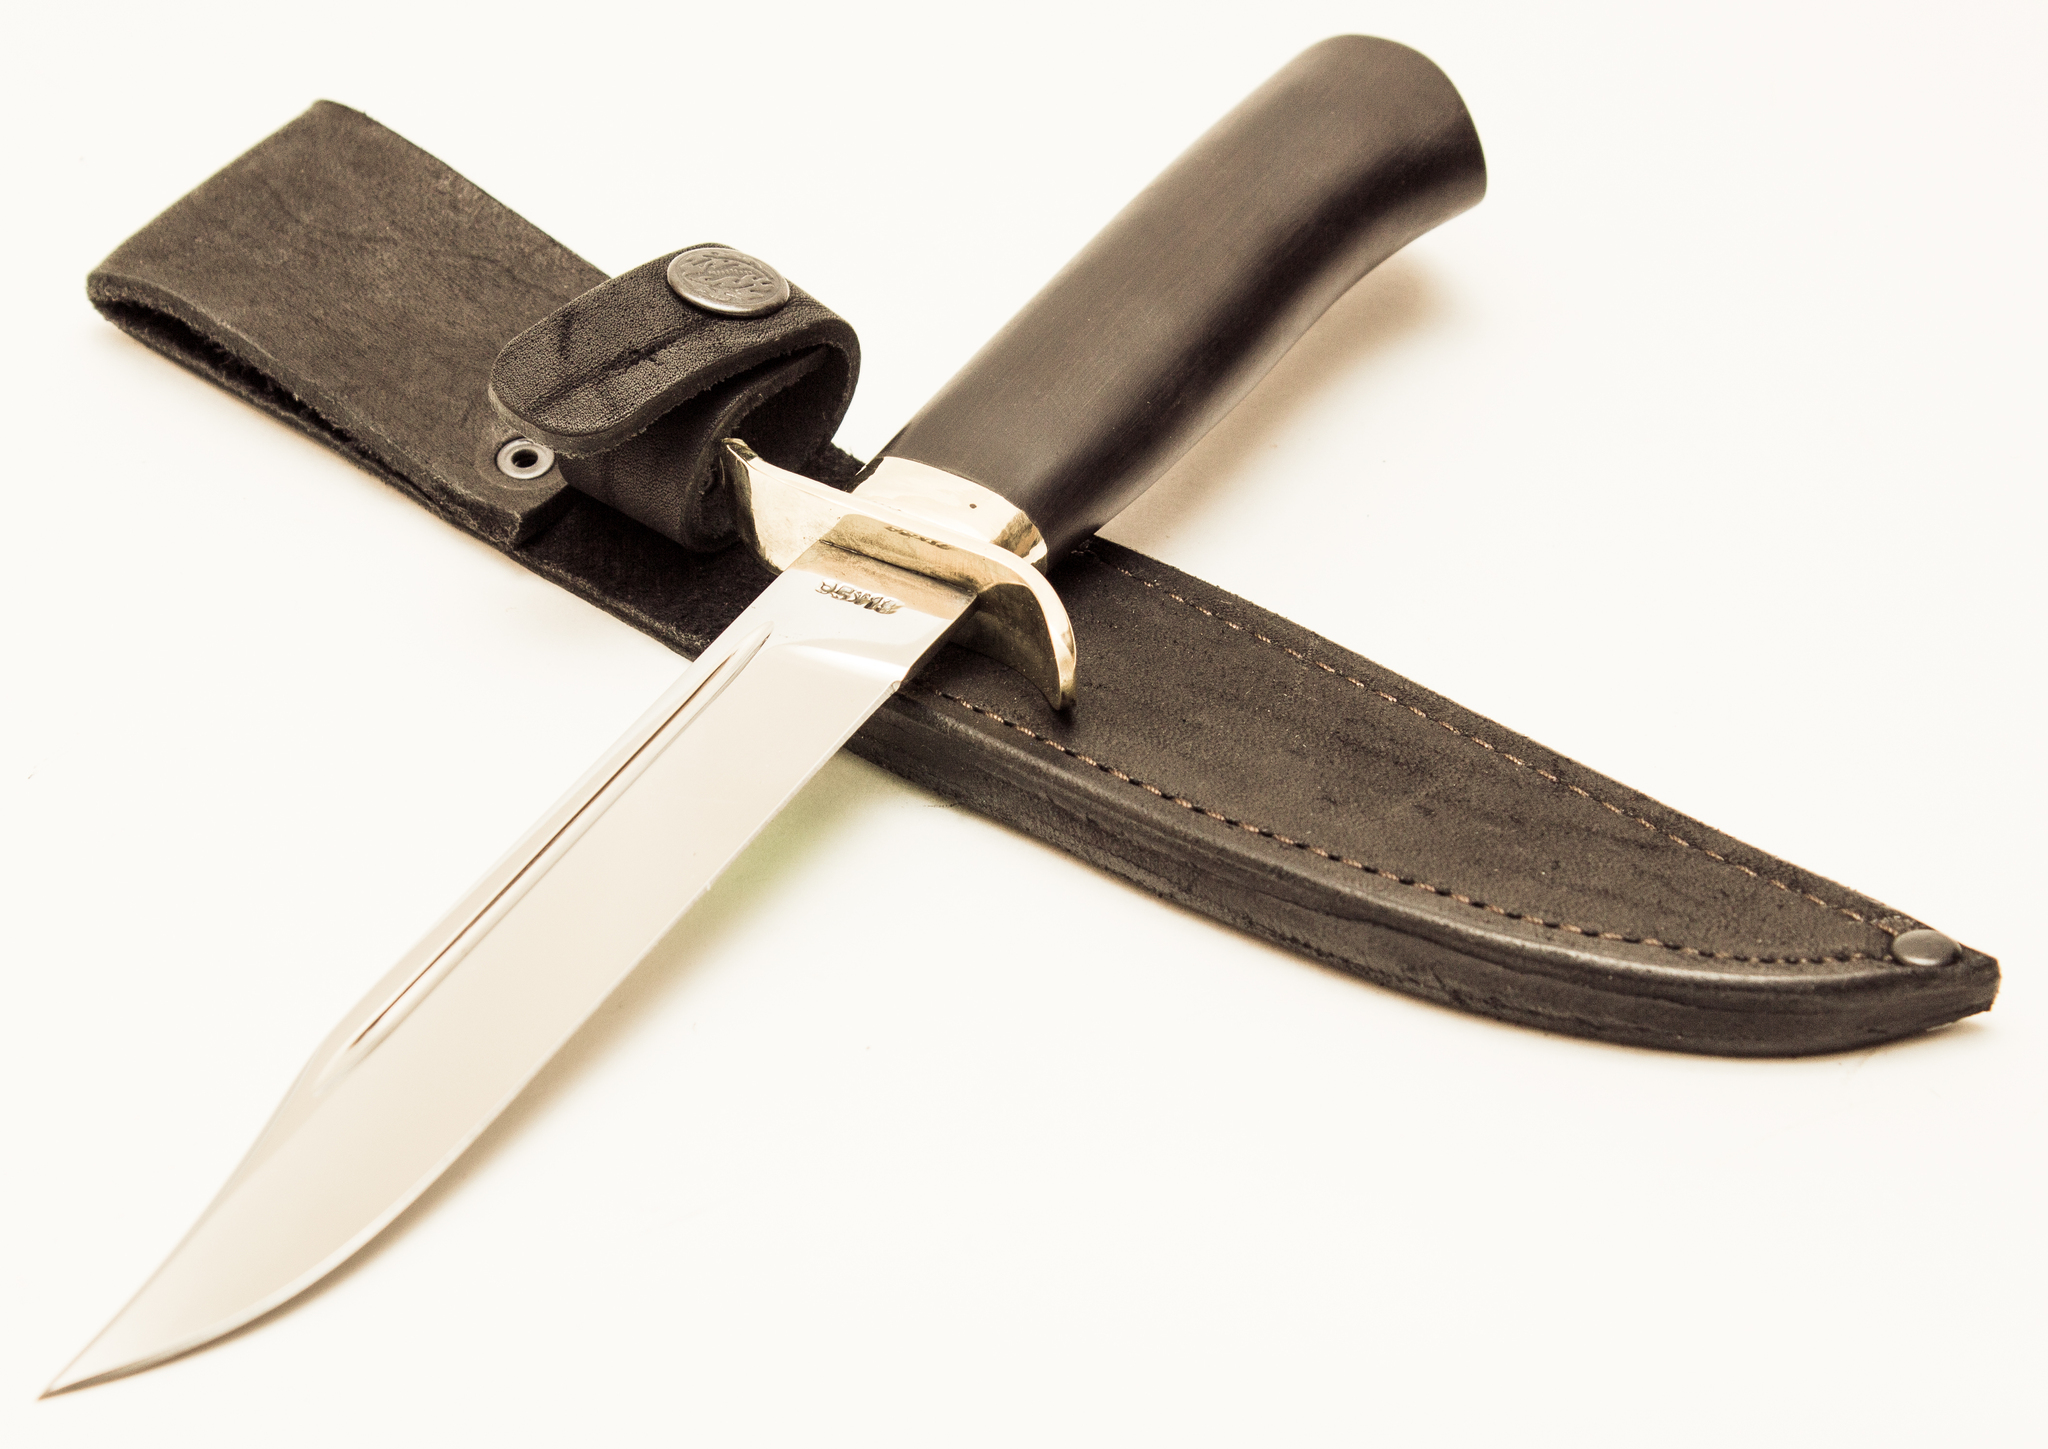 цена на Нож разведчика НР-40, кованый, сталь 95х18